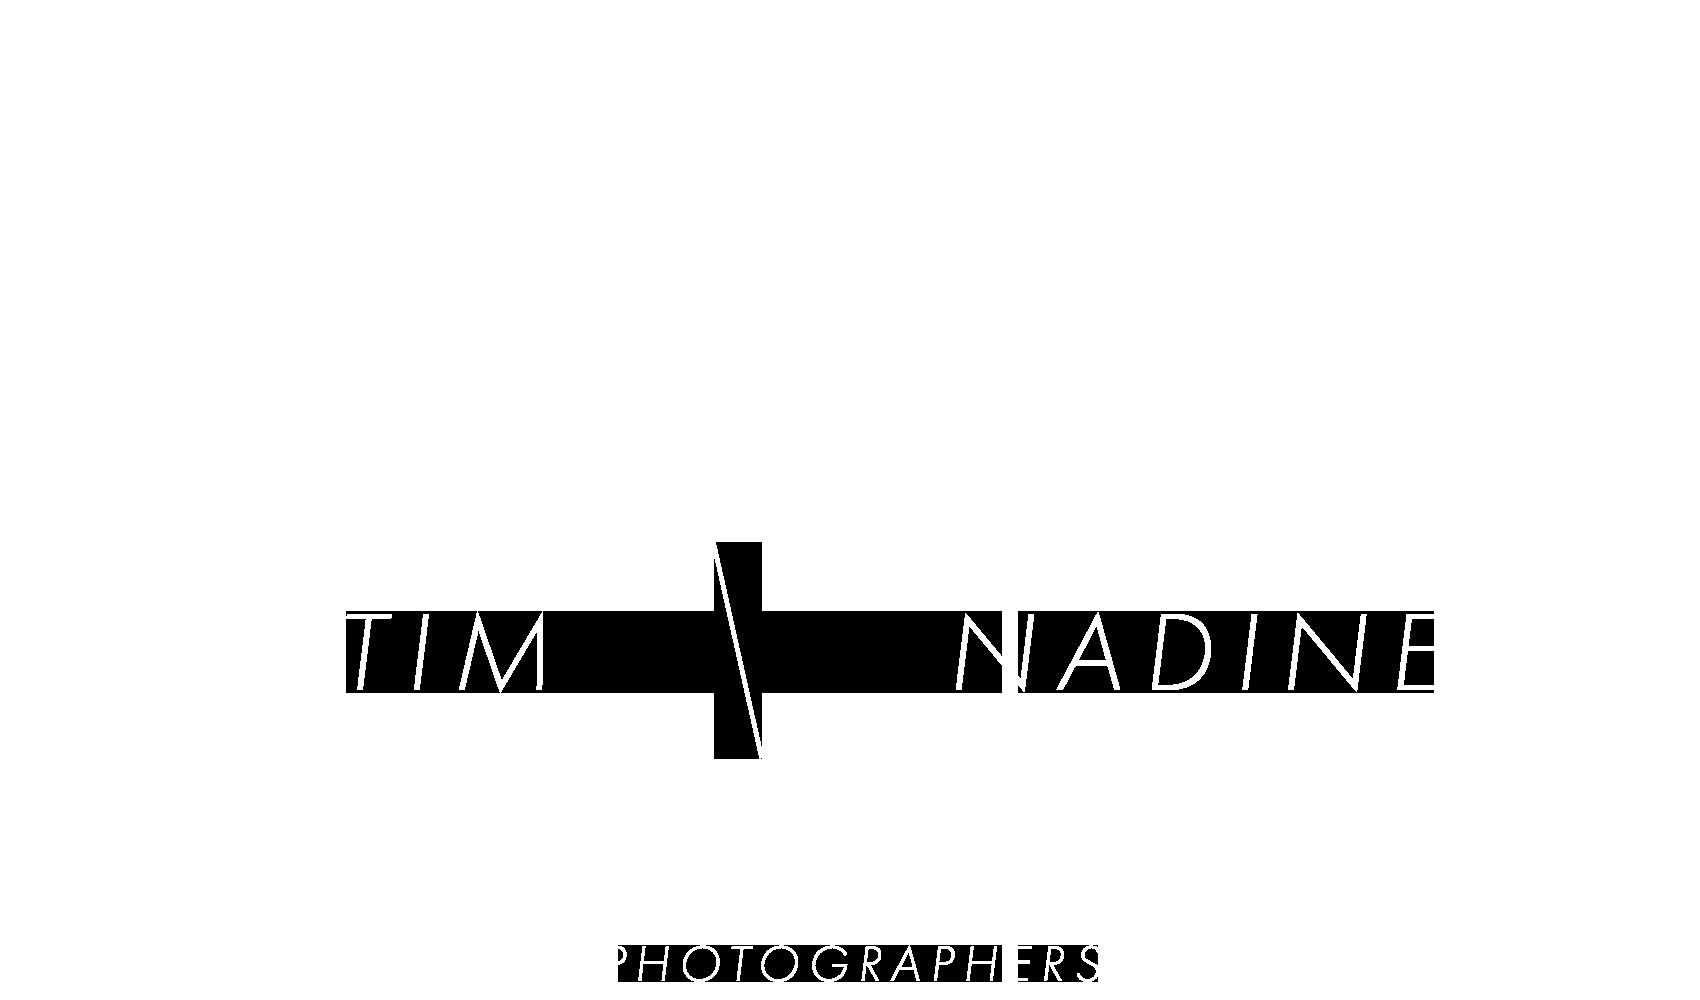 Tim and Nadine Logo white 2.png